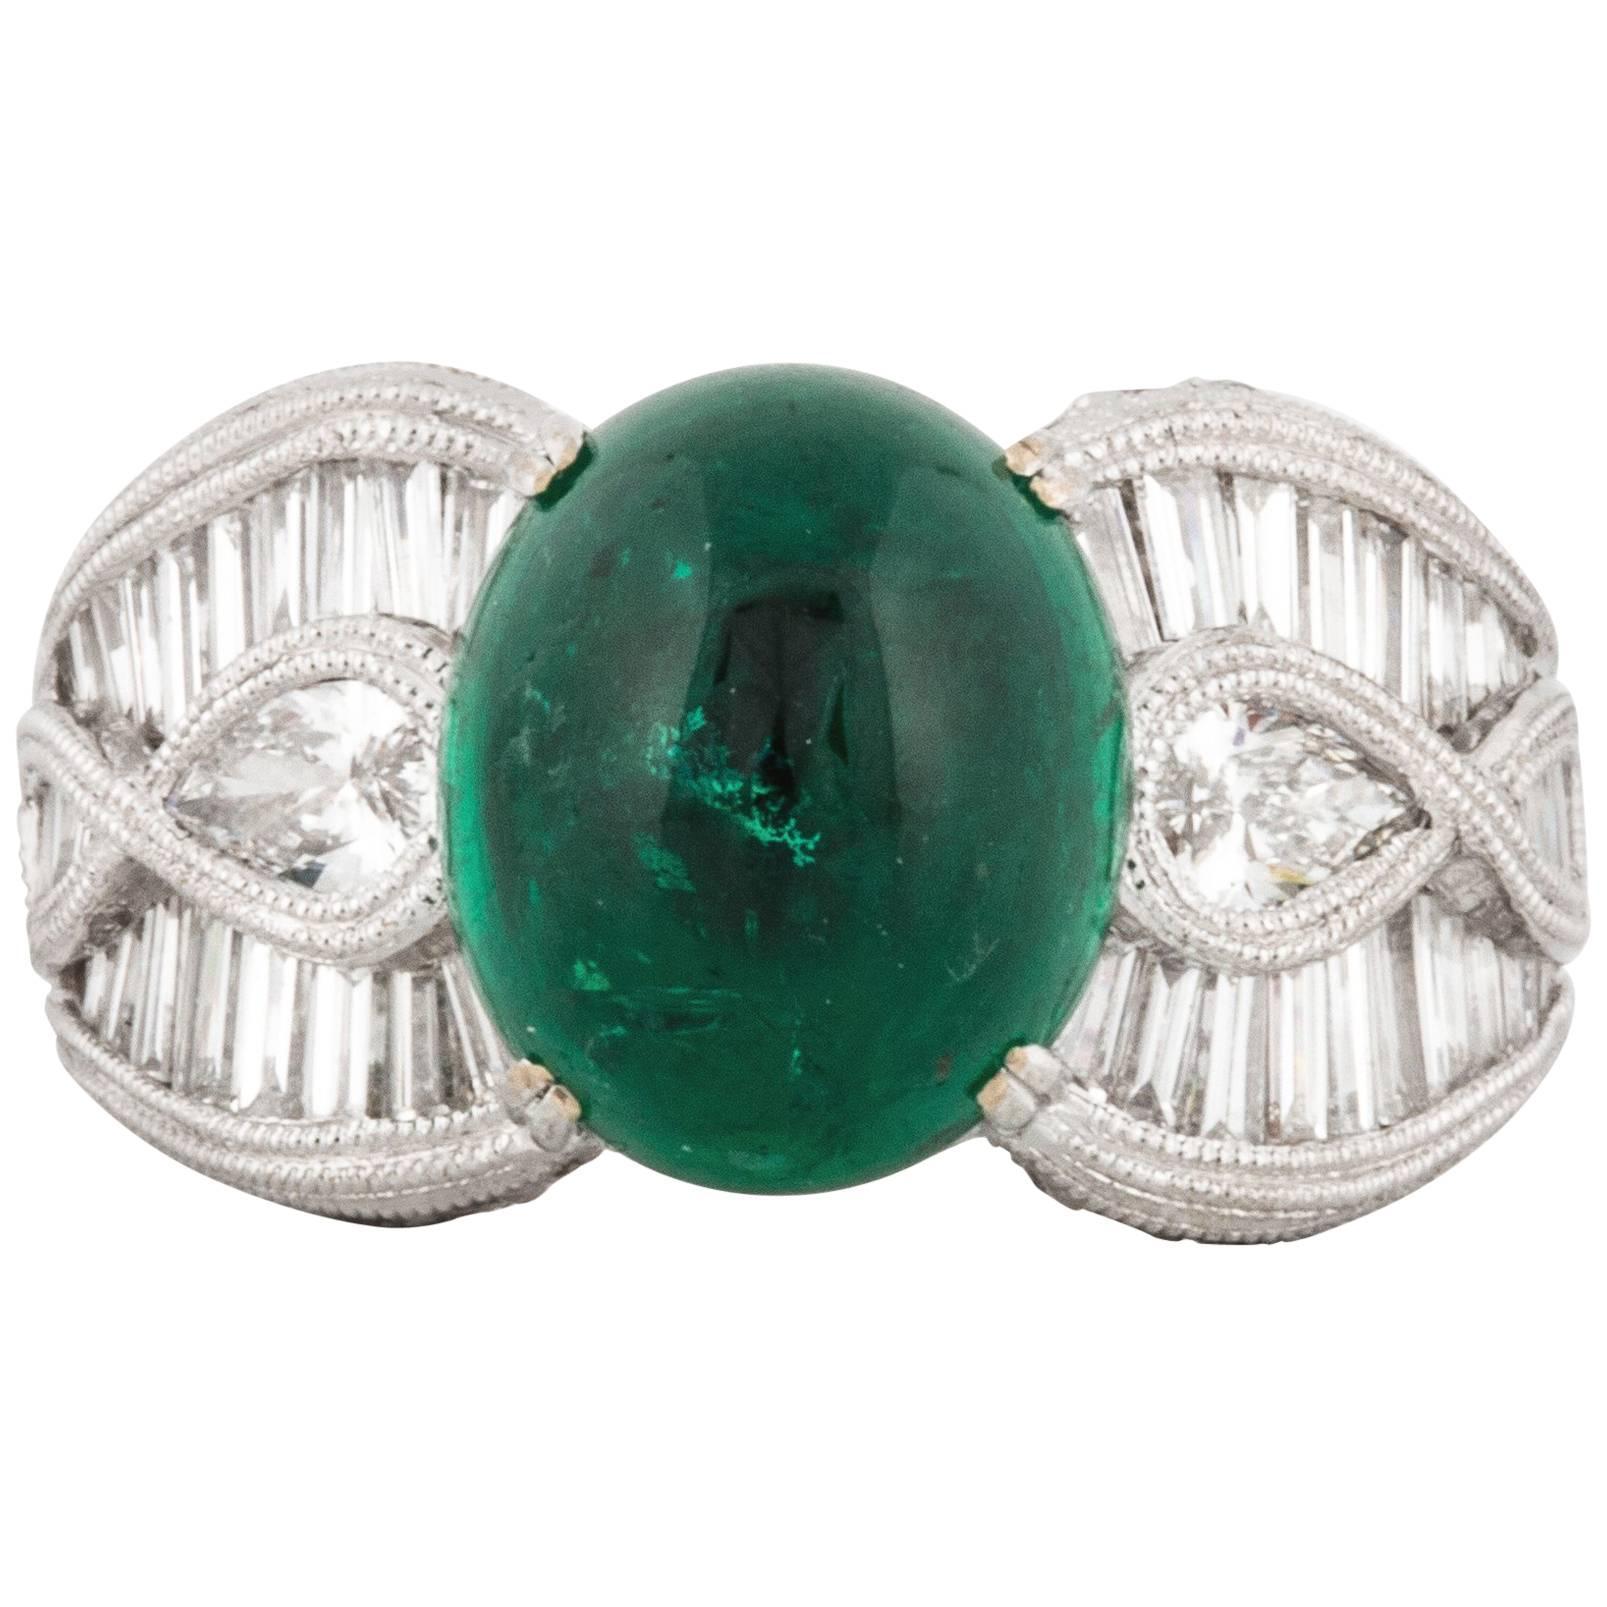 Cabochon Emerald and Diamond 18K White Gold Ring